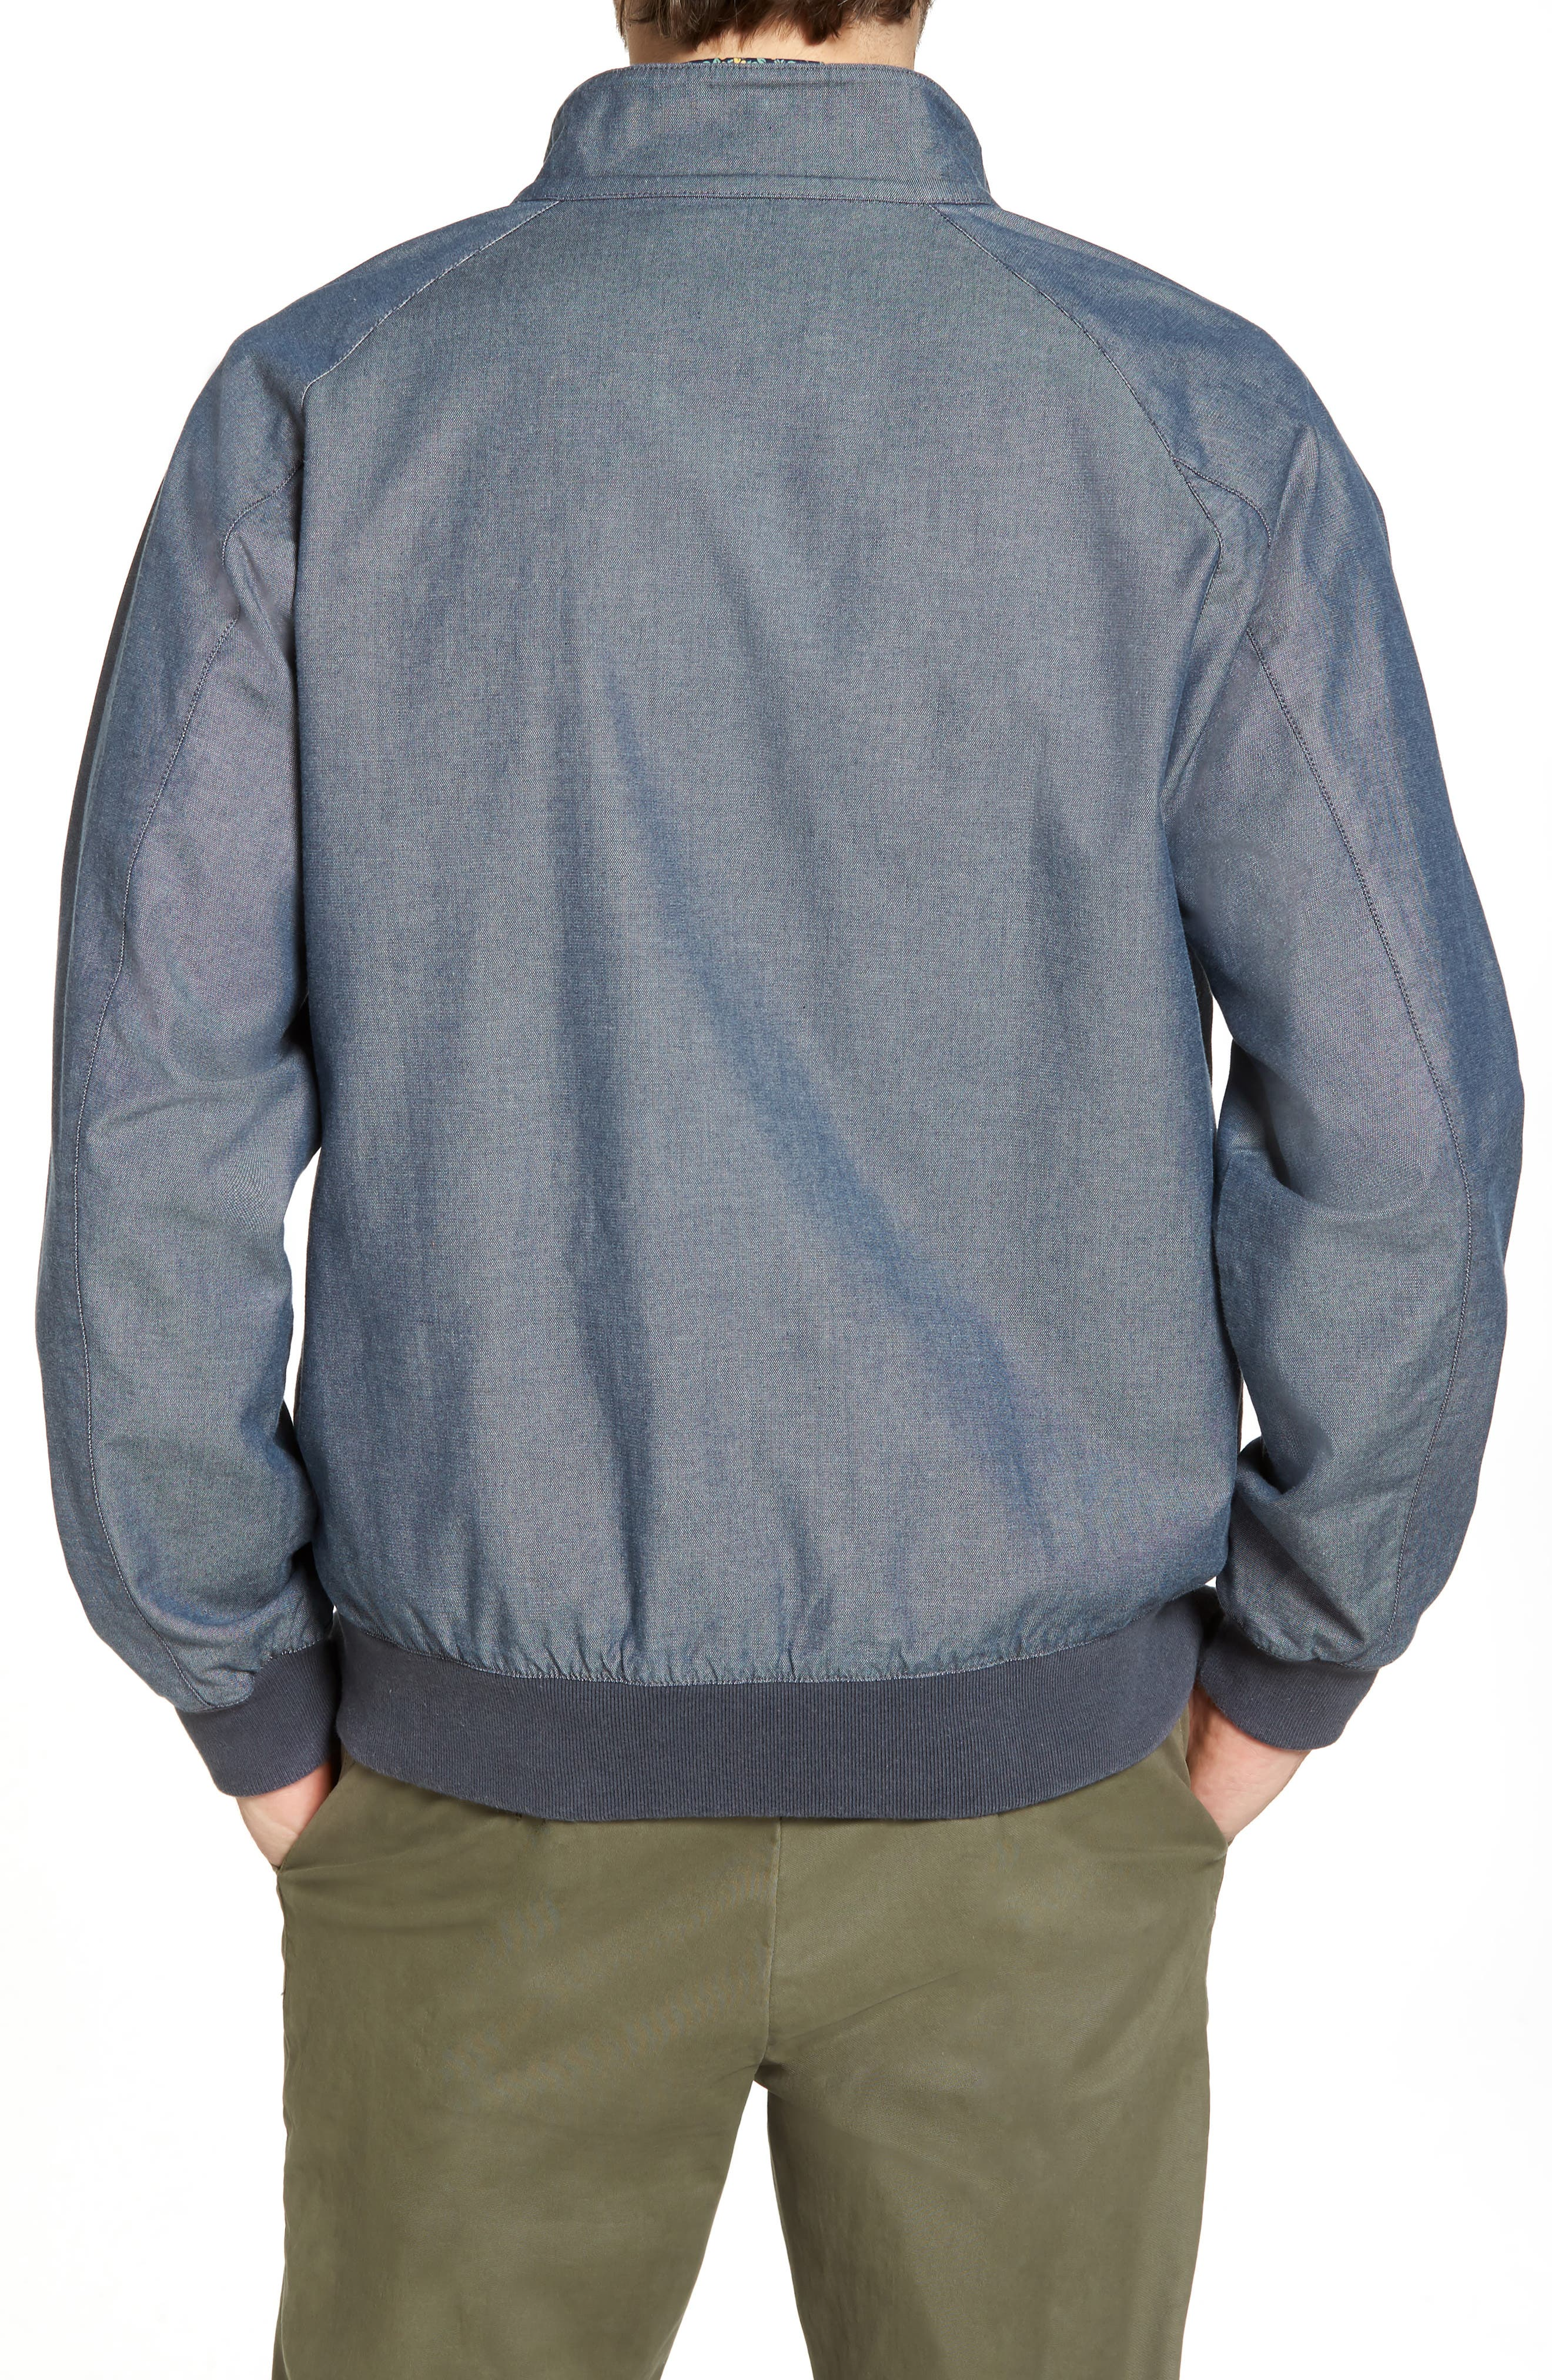 Harrington Jacket,                             Alternate thumbnail 2, color,                             Blue Vintage Chambray